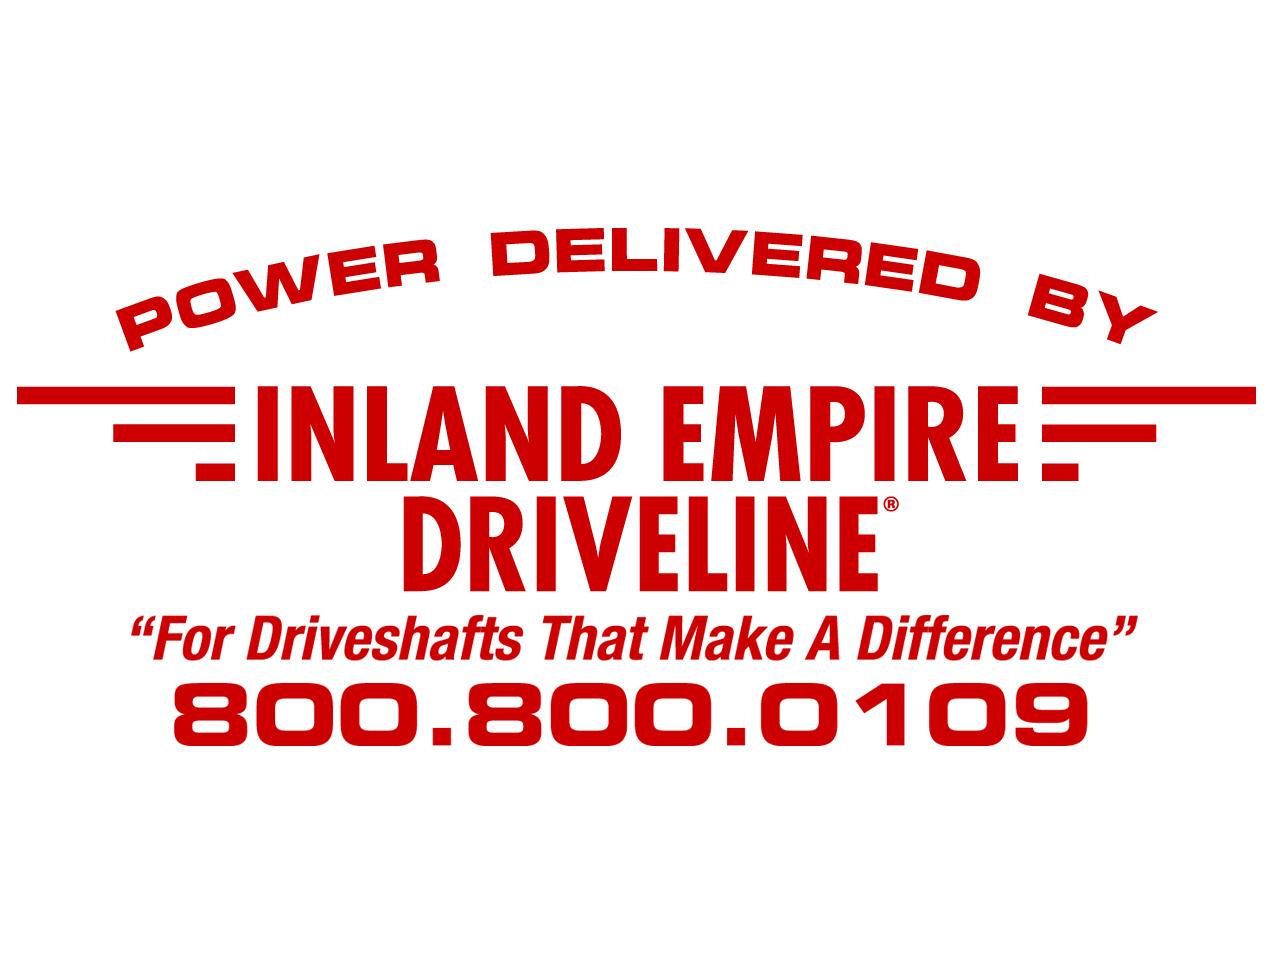 INLAND EMPIRE DRIVELINE SERVICE, INC.